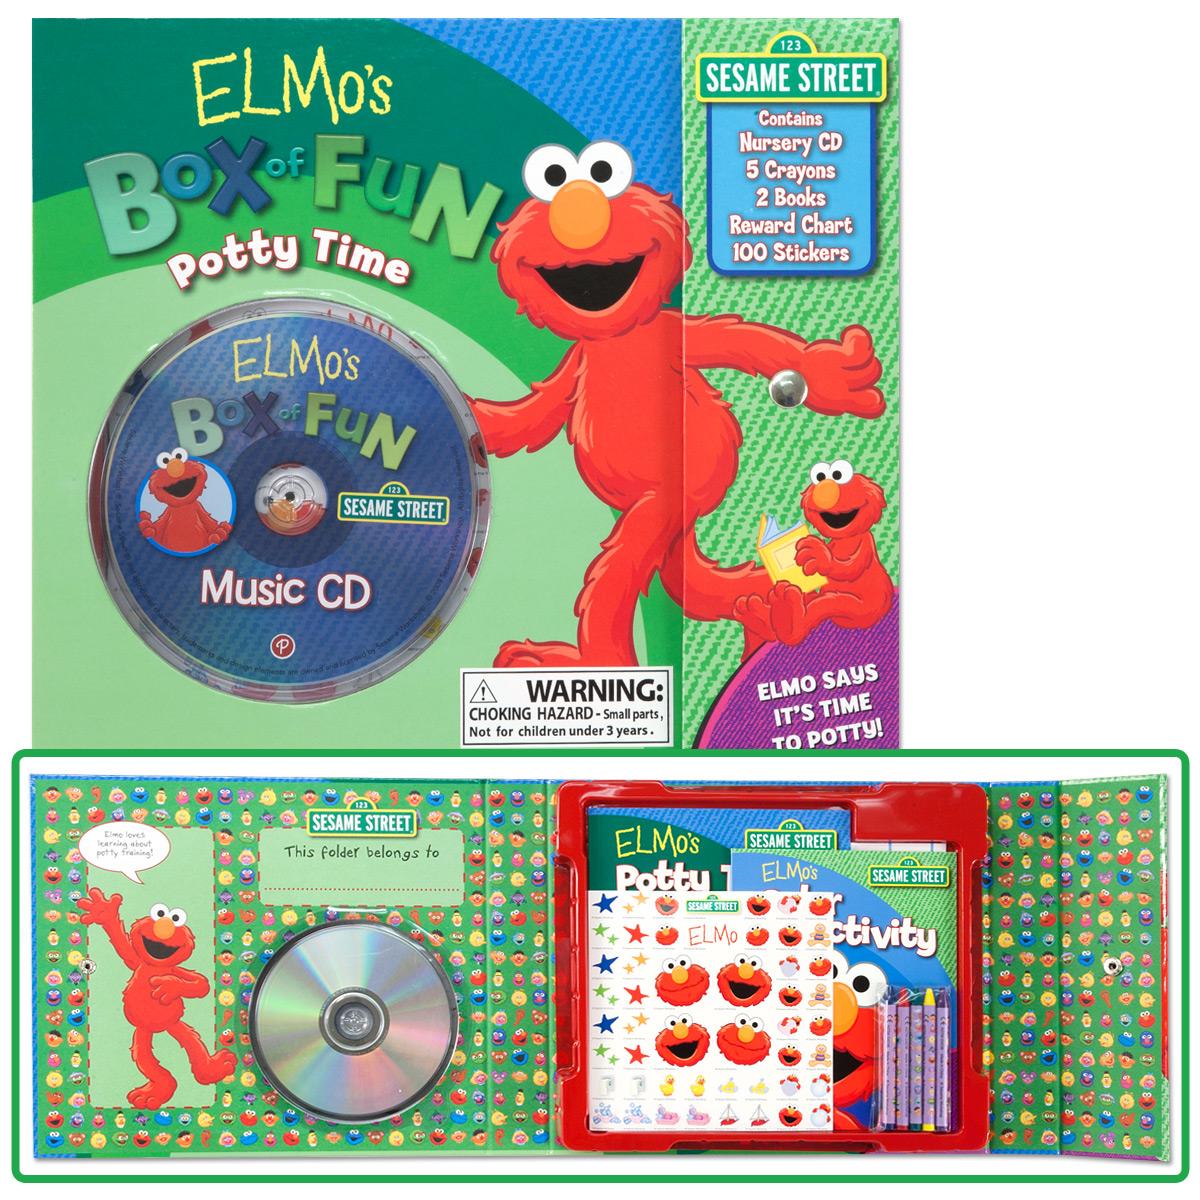 elmo s box of fun potty time muppet wiki fandom powered by wikia elmosboxoffunpottytime